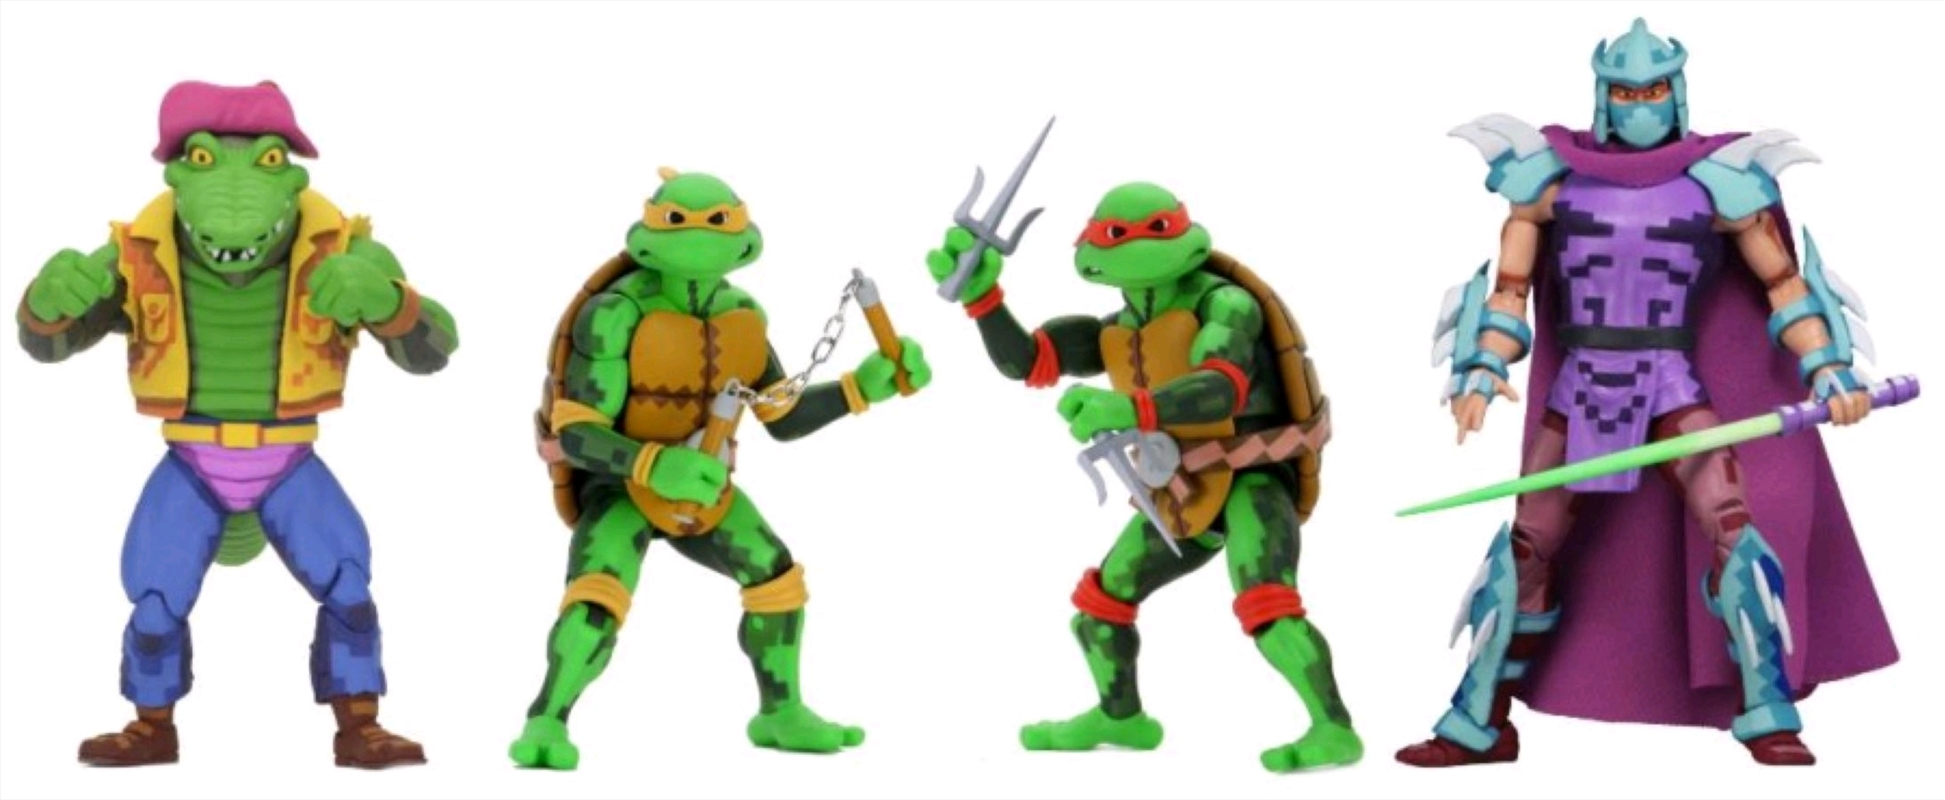 "Teenage Mutant Ninja Turtles - Turtles in Time series 02 7"" Action Figure Assortment   Merchandise"